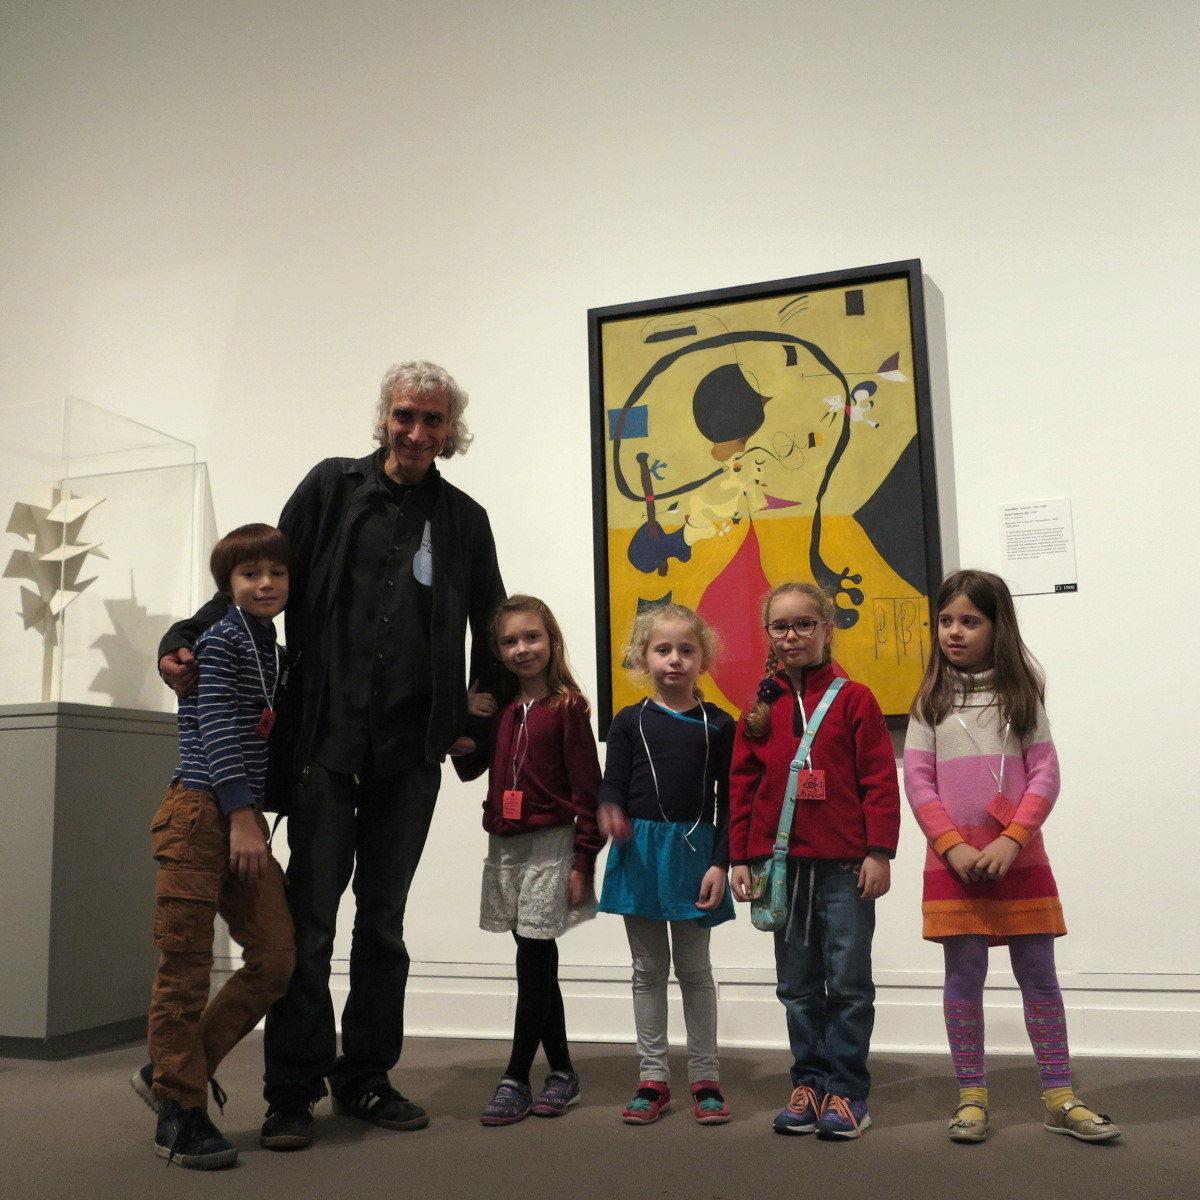 Metforkids Museum tours Met with Boris Kuznetsov Oct 16th, 2016